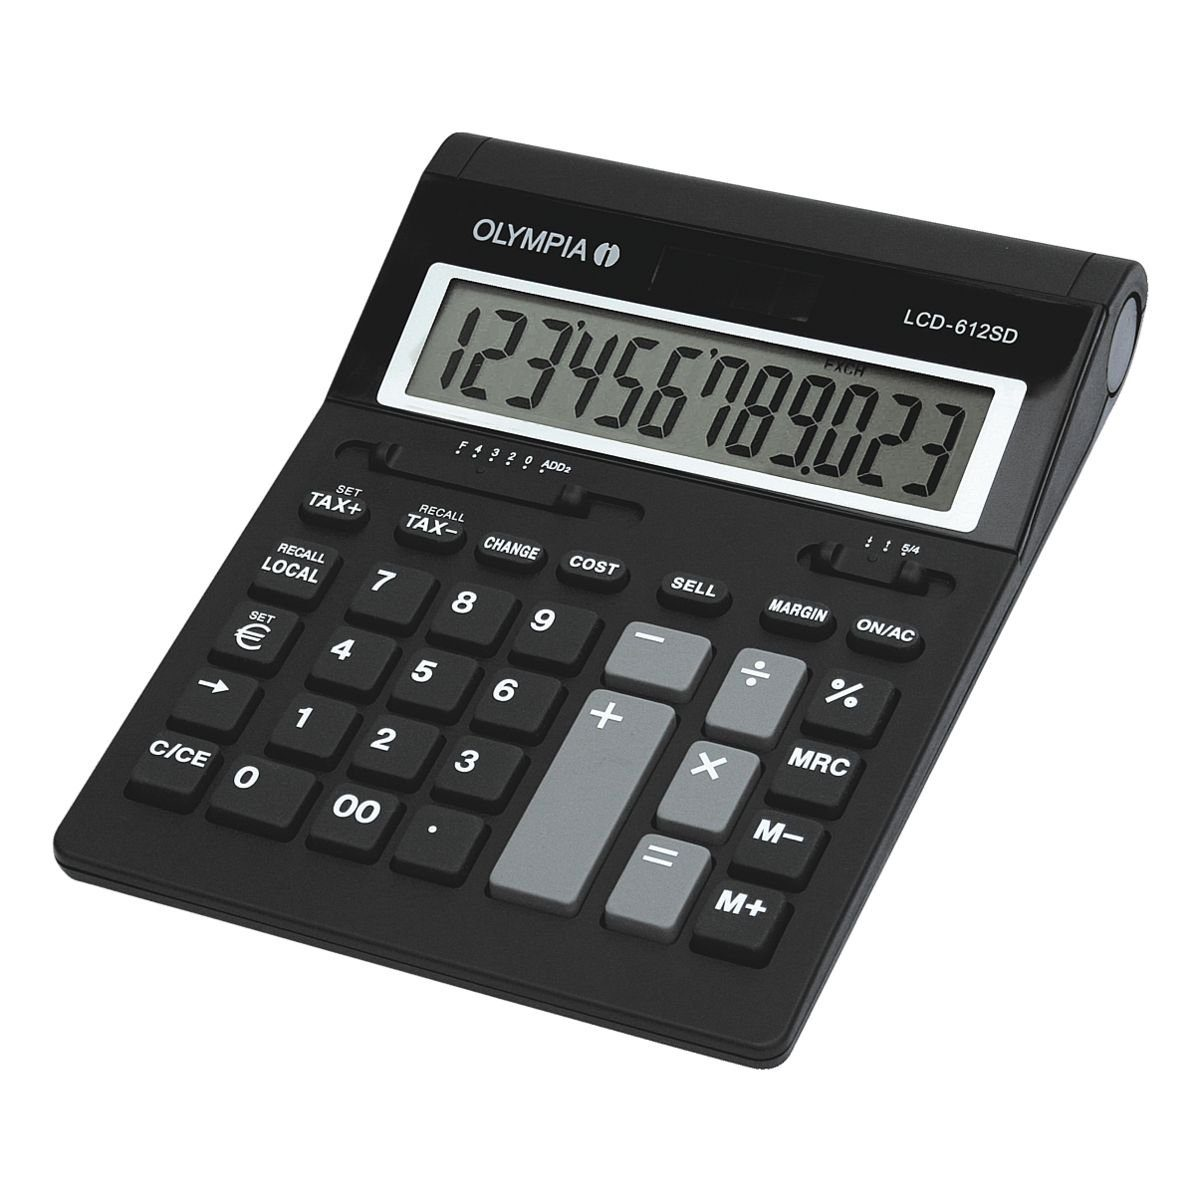 OLYMPIA OFFICE Tischrechner »LCD 612 SD«